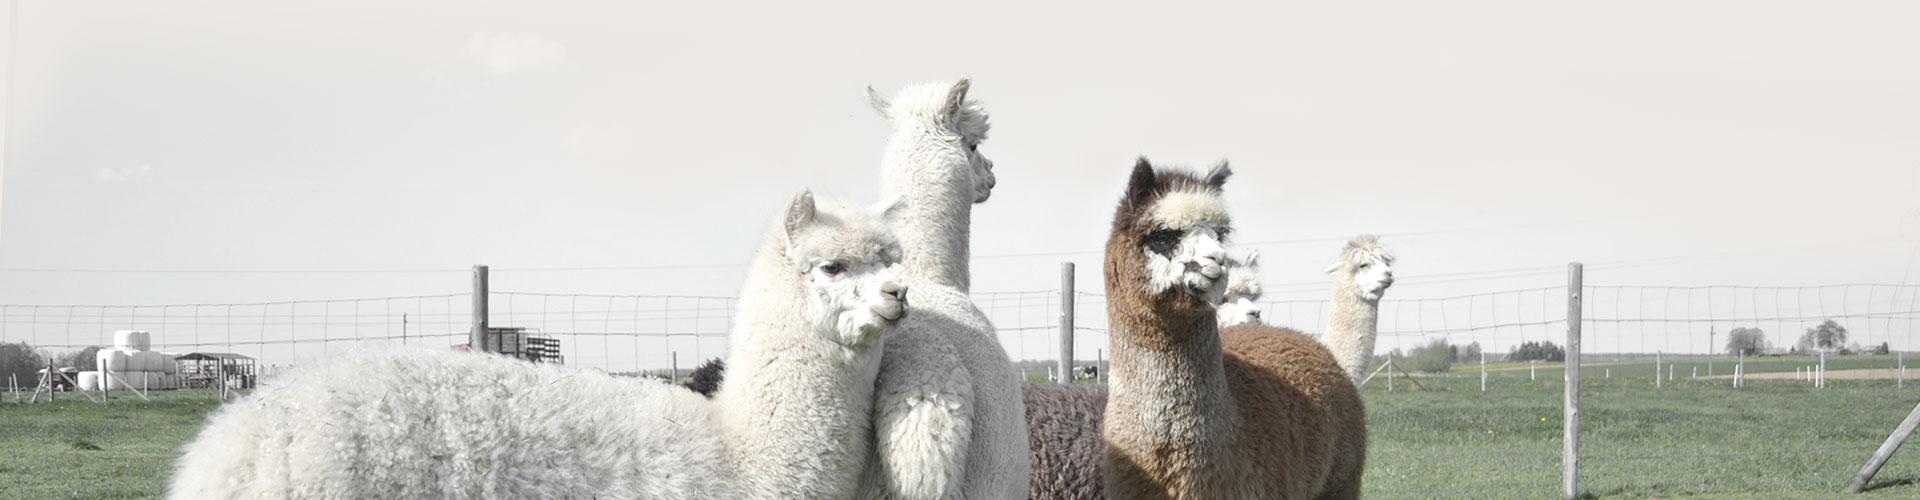 Alpakos